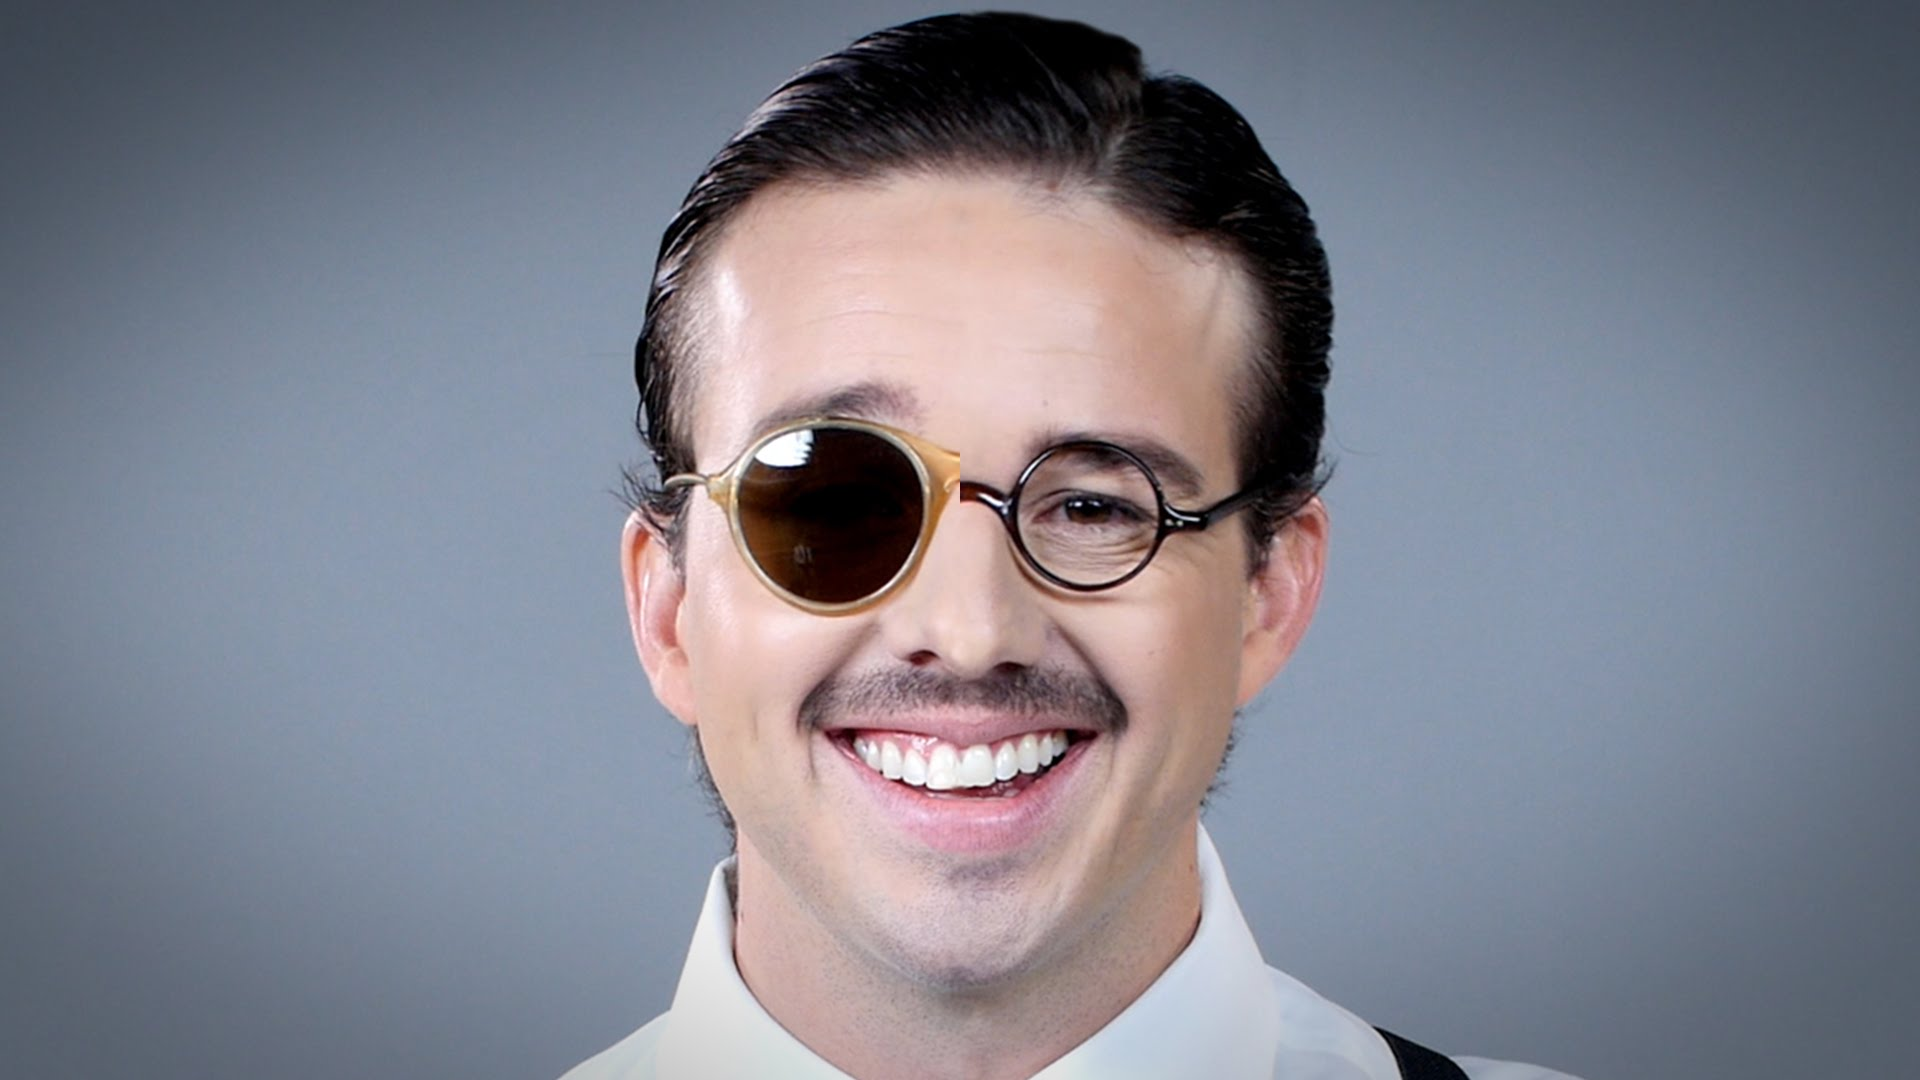 Men's eyewear evolution